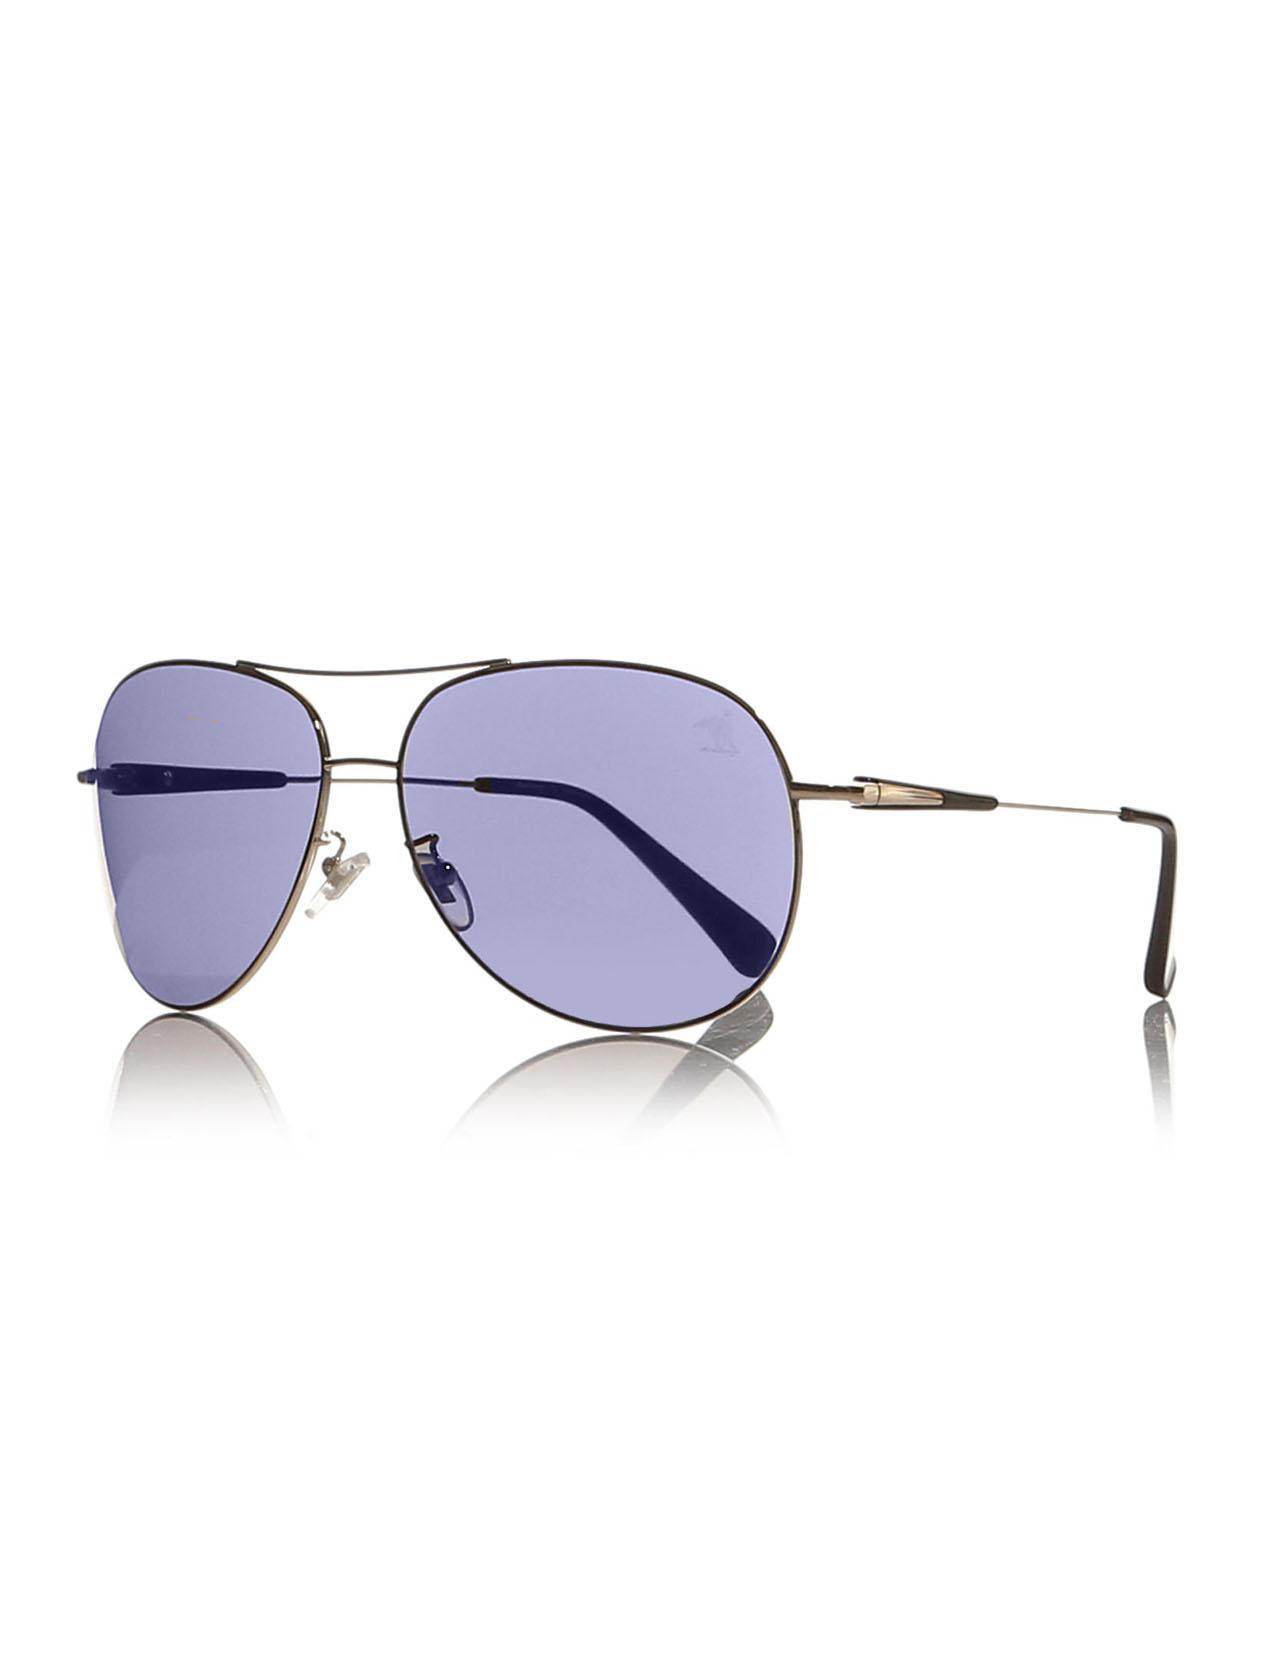 Men's Metal Frame Sunglasses